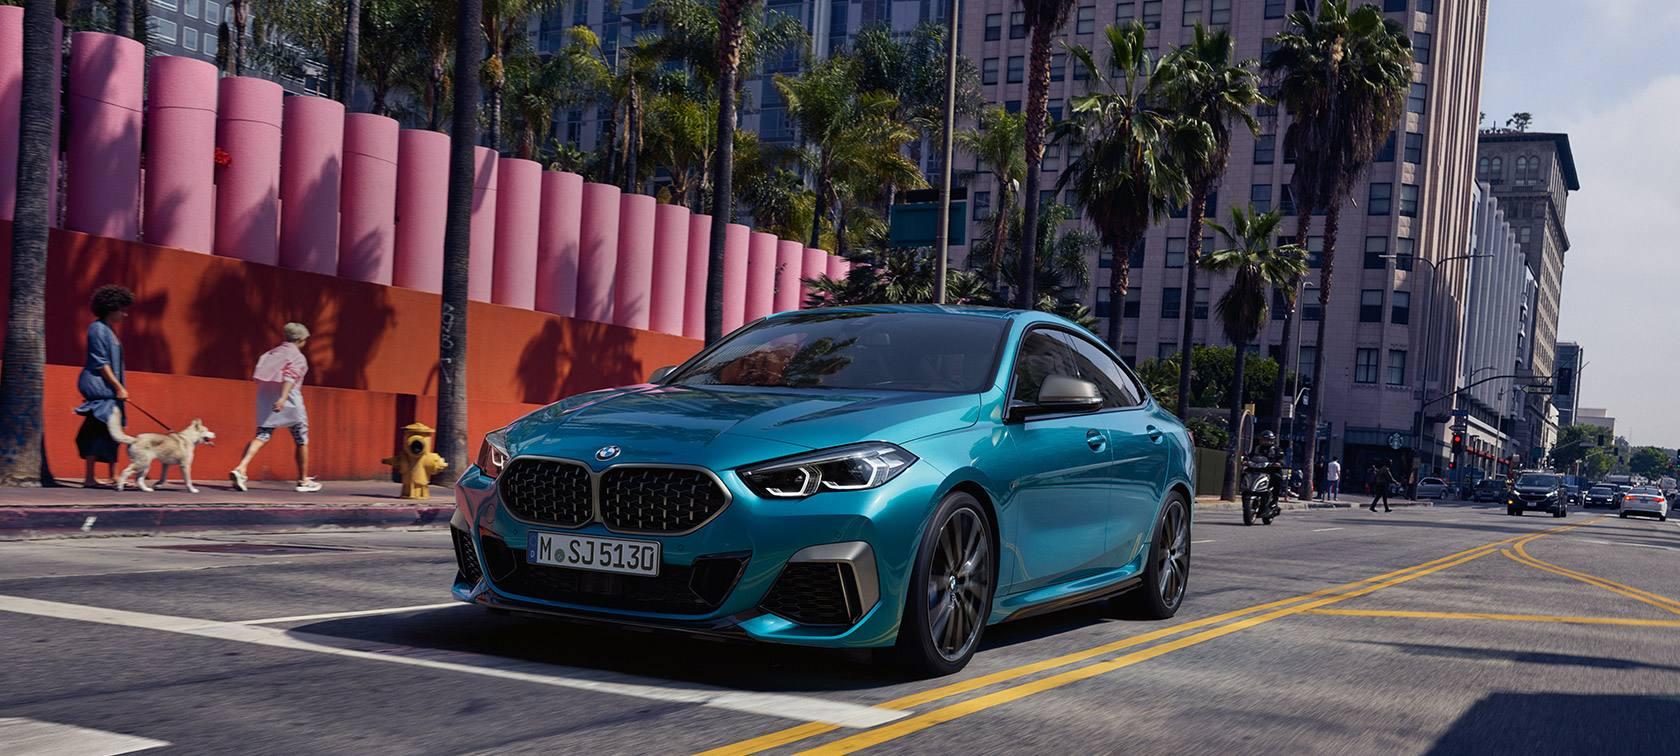 Offre BMW Maroc THE 2 Serie 2 Gran Coupé Prix Maroc